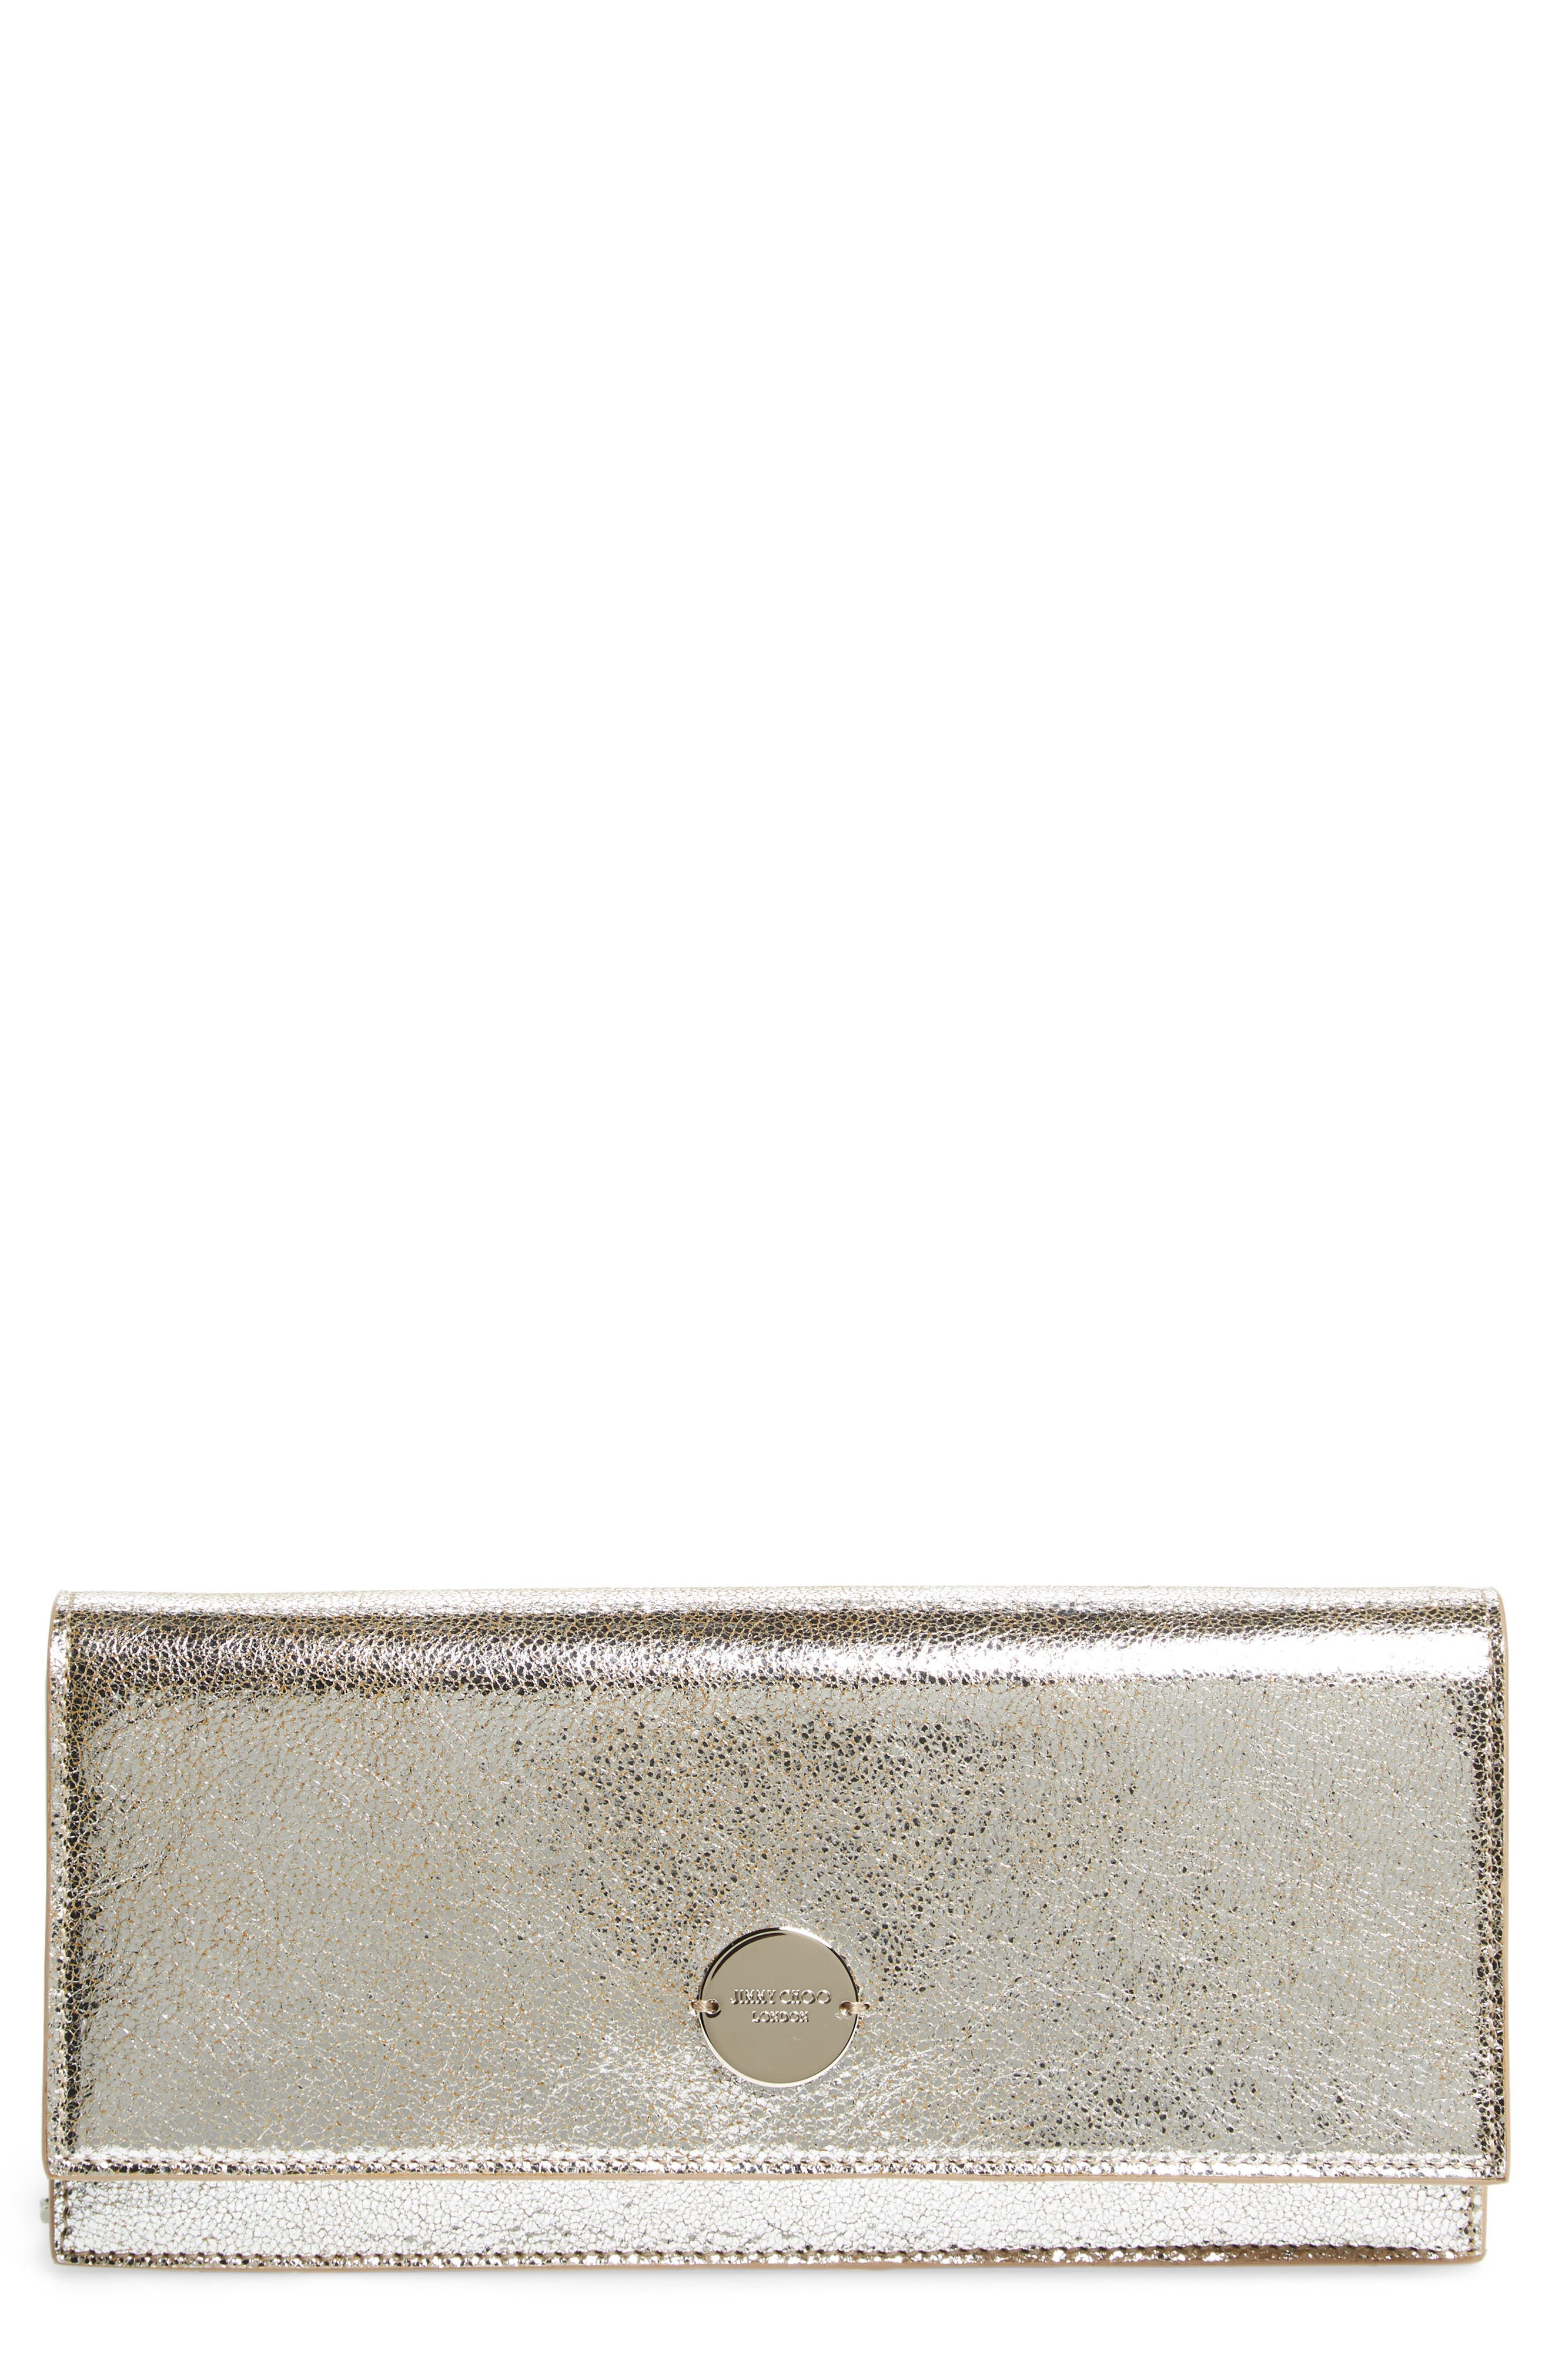 Fie Metallic Leather Clutch,                         Main,                         color, 040